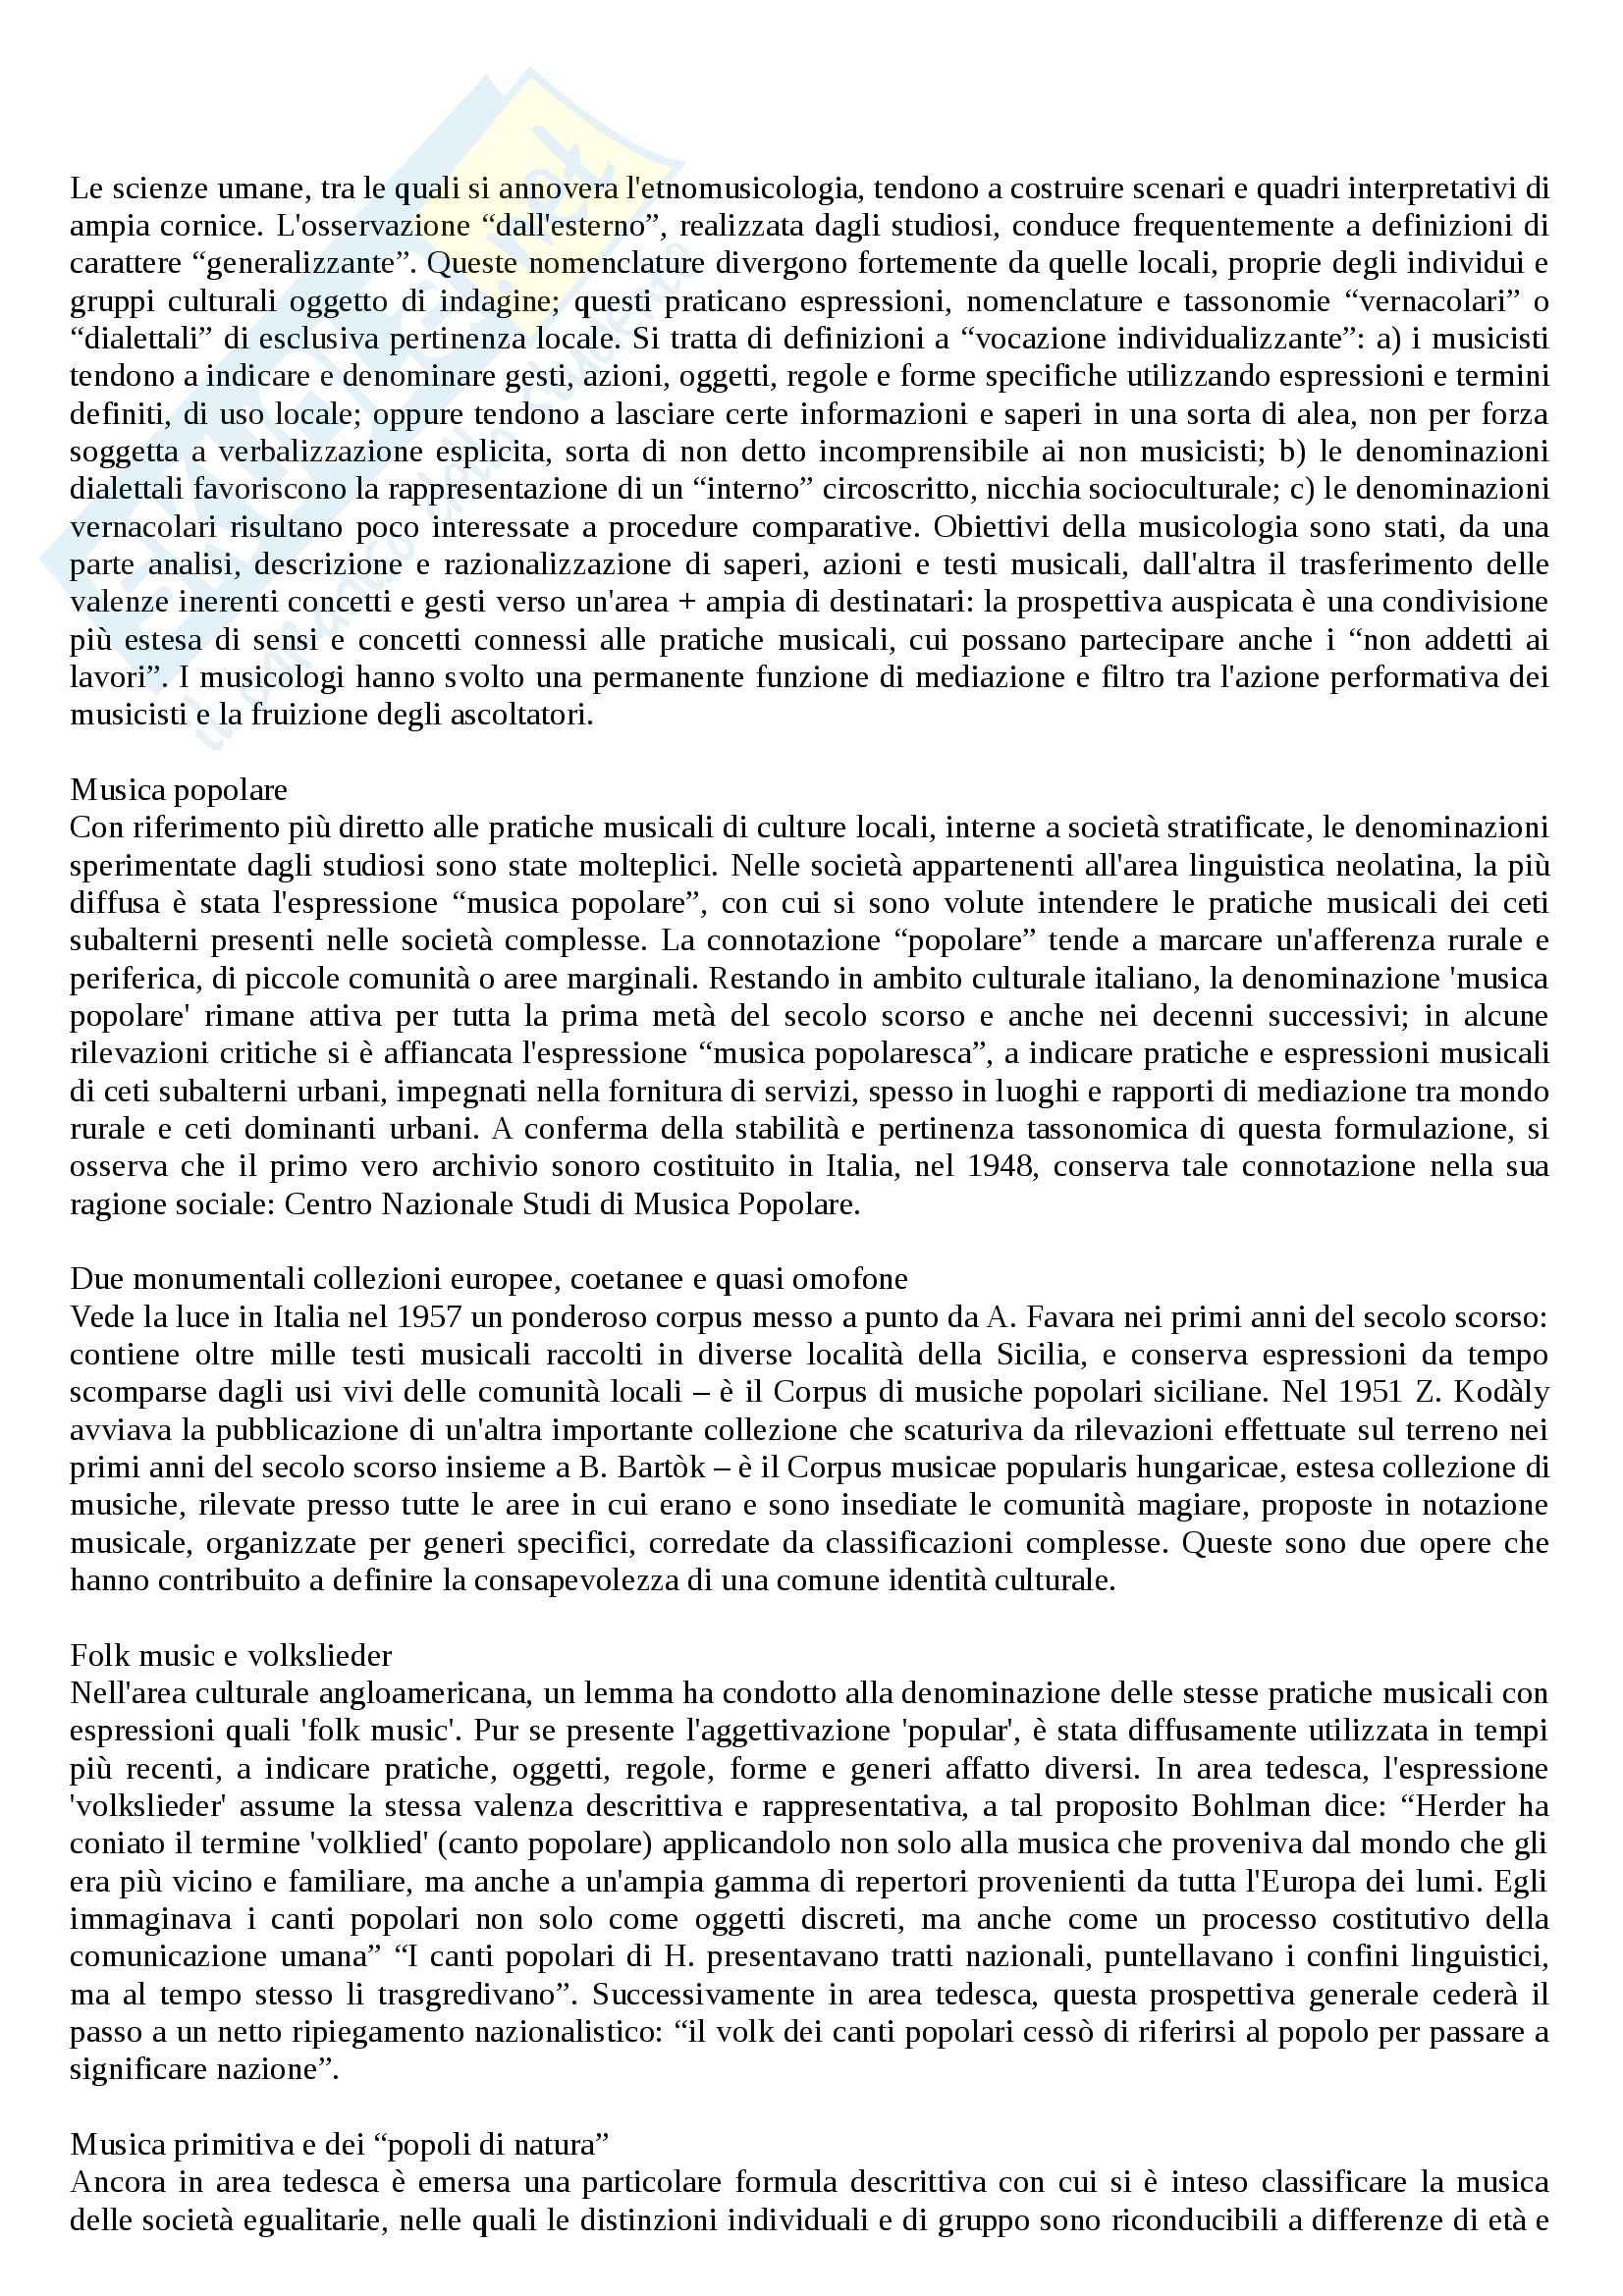 appunto M. Agamennone Etnomusicologia